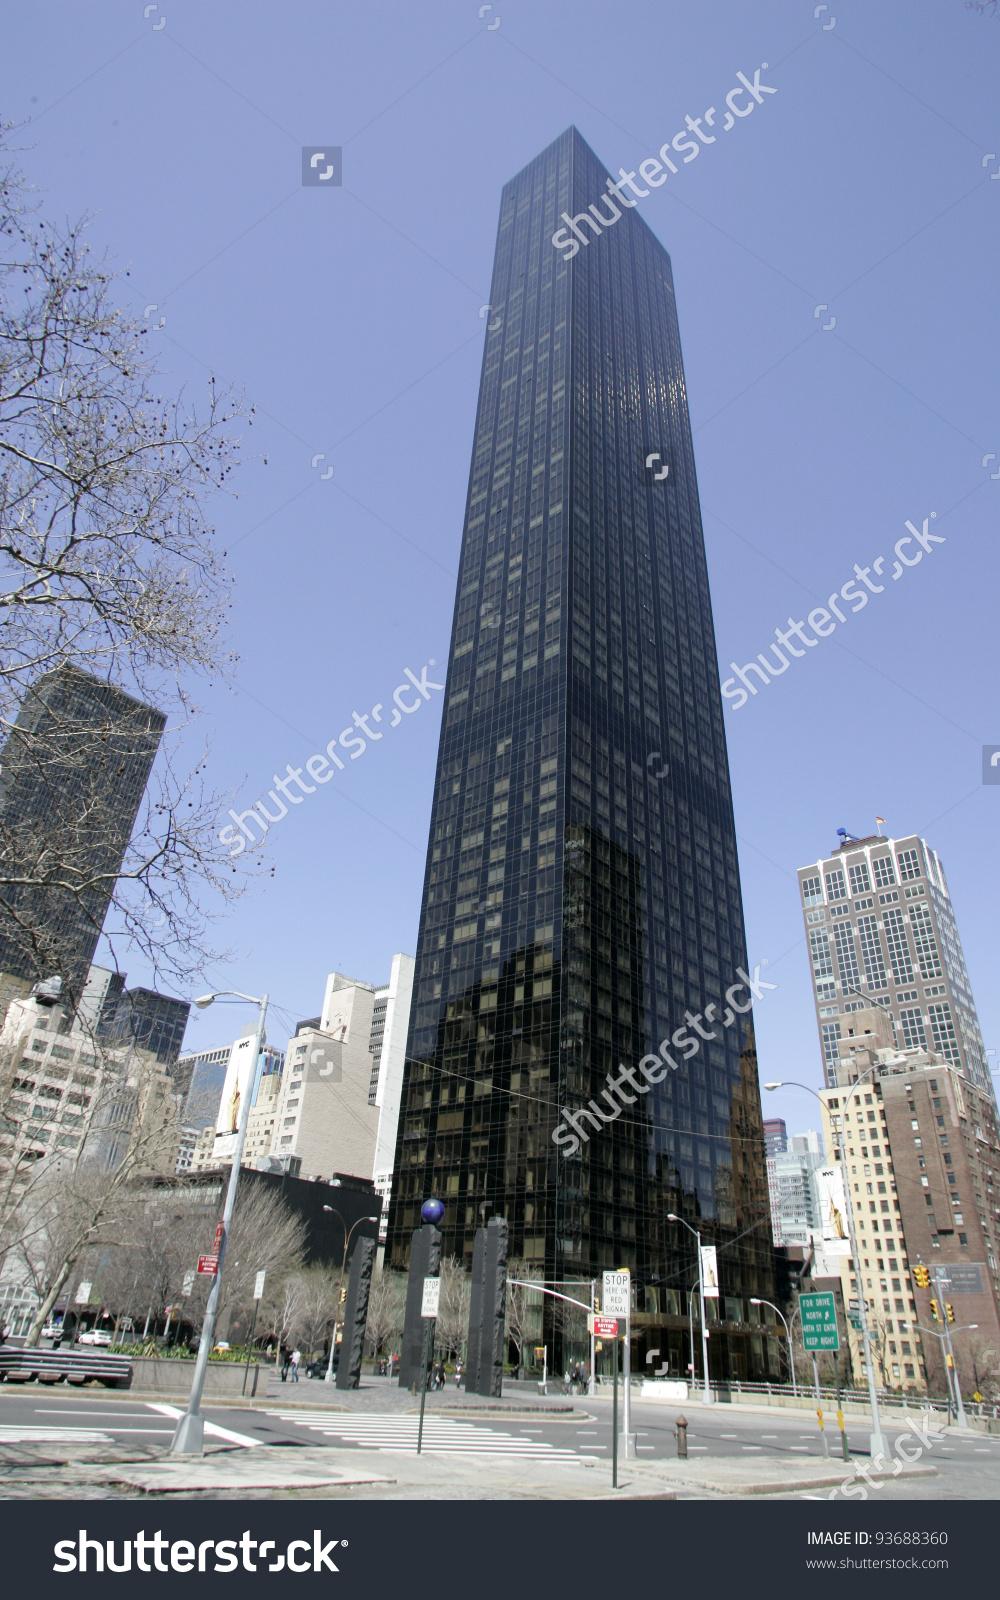 New York Apr 5 Trump World Stock Photo 93688360.